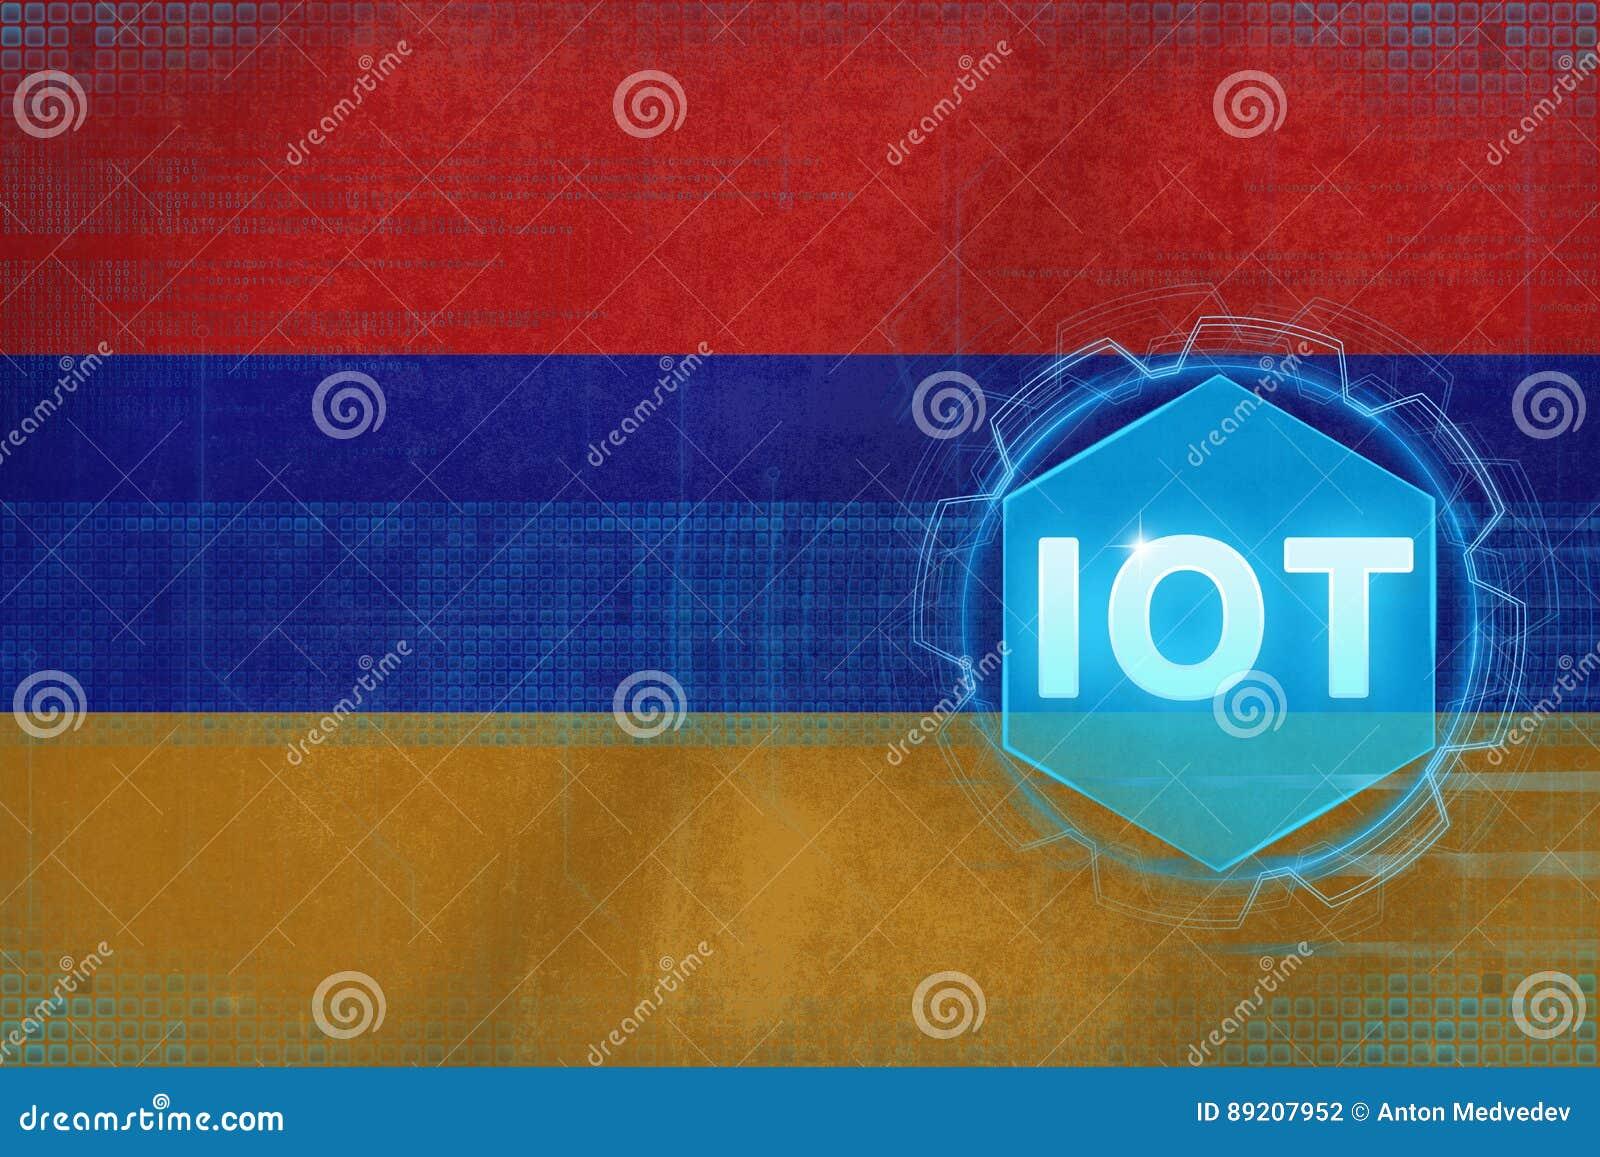 Armenia IOT (Internet of things). Internet of Things modern concept.